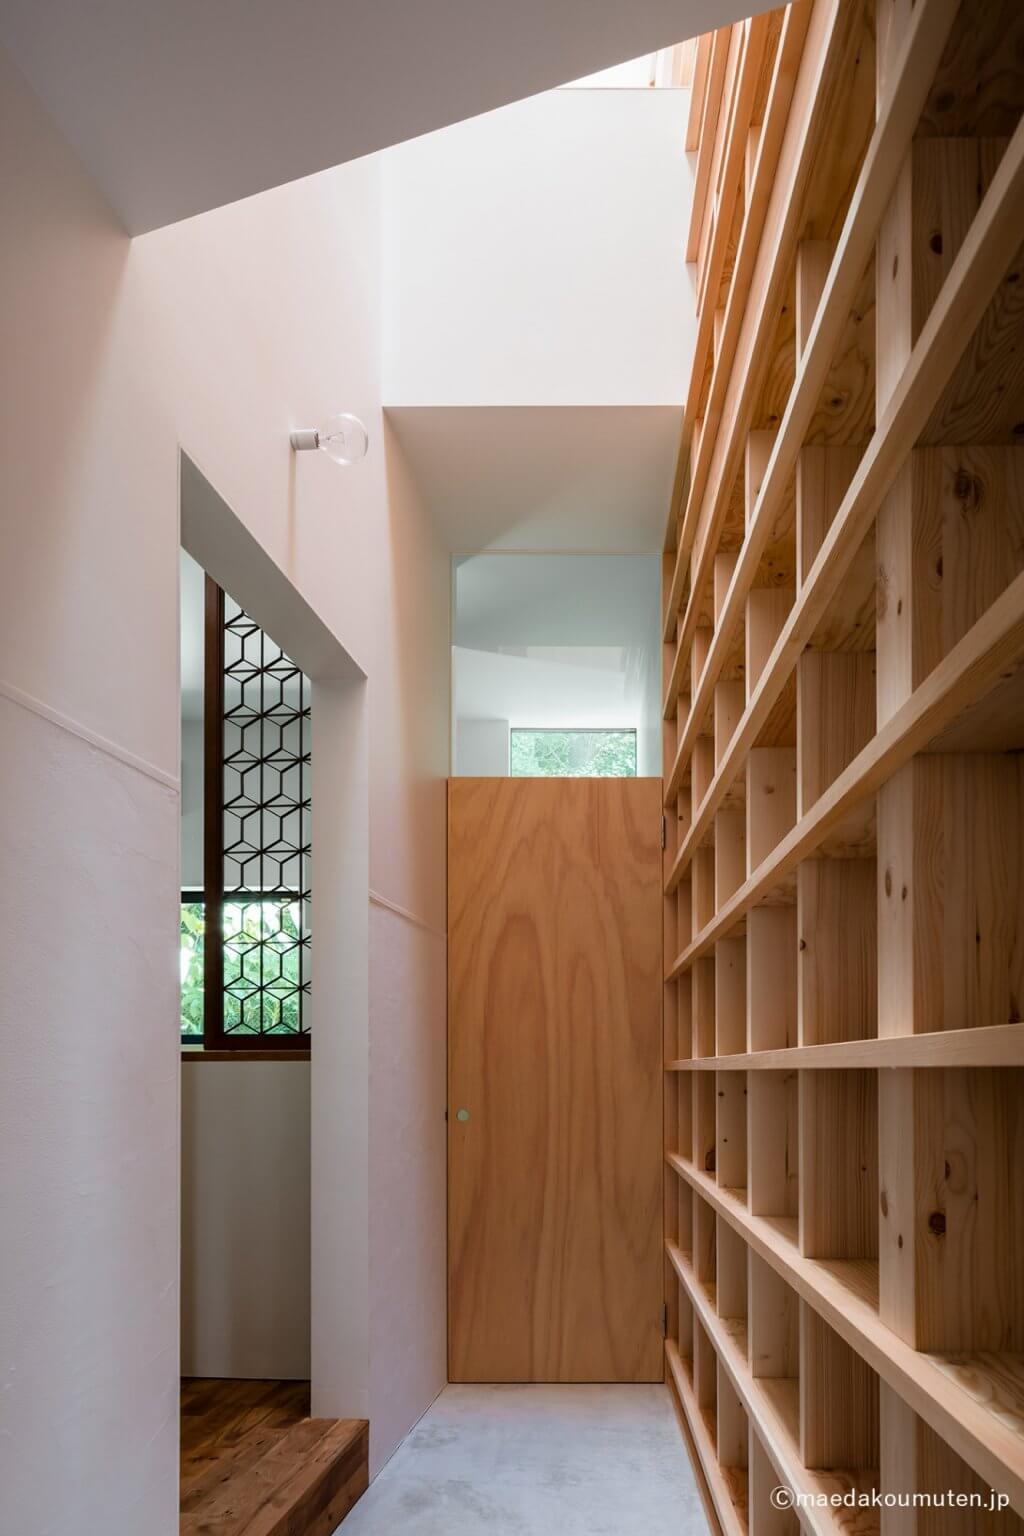 神奈川、工務店、注文住宅、デザイン住宅、建築家、亀井野の家、04